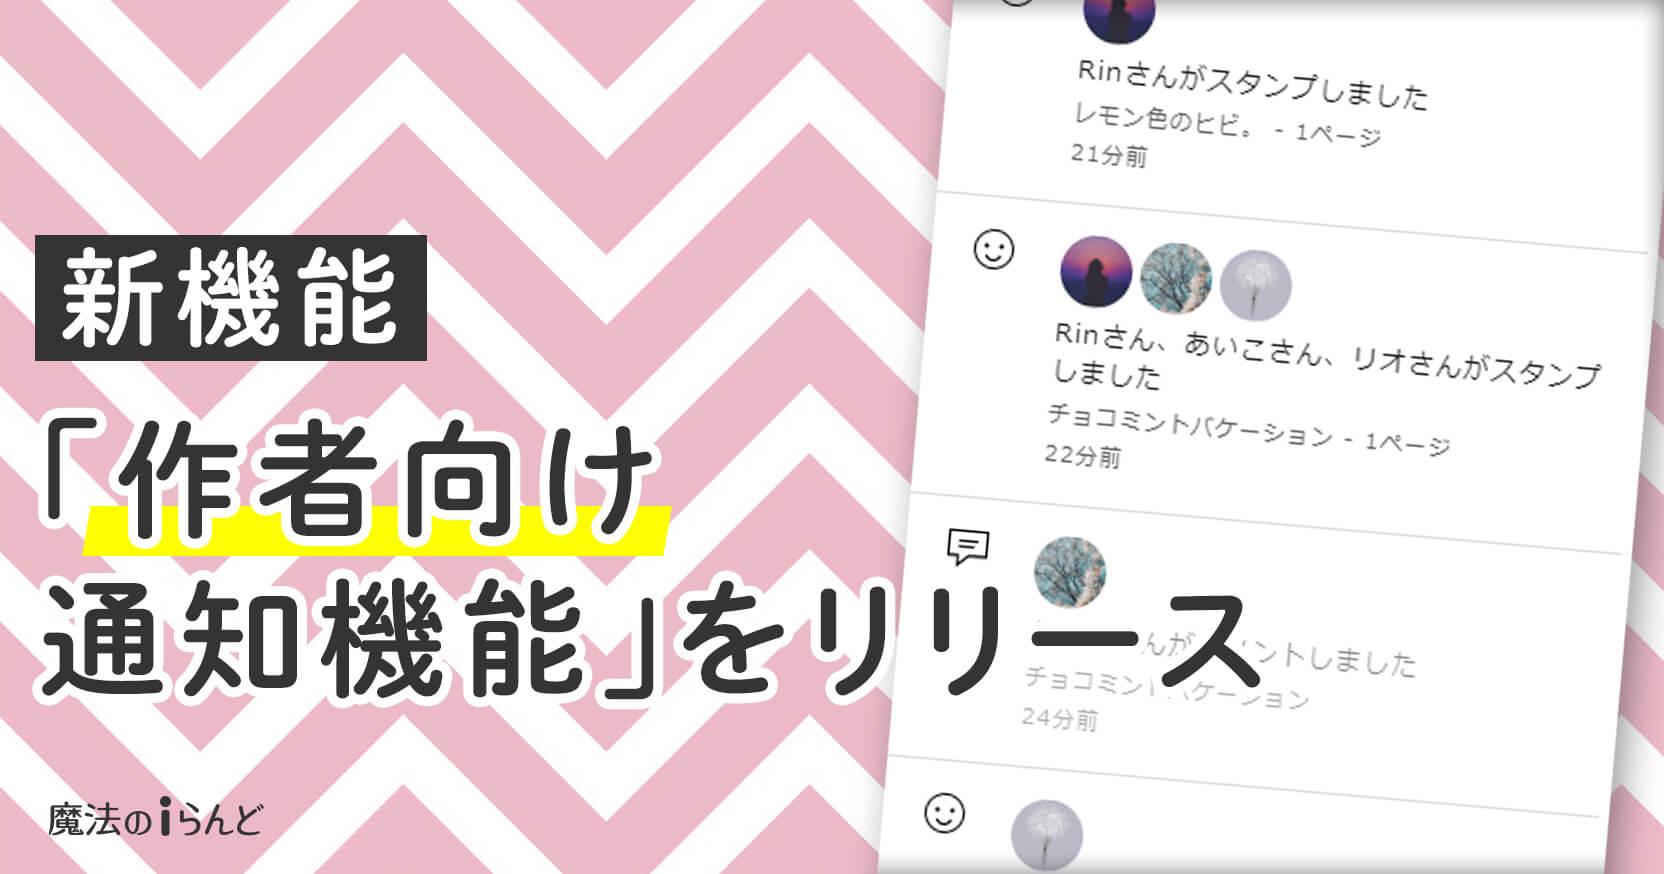 https://storage.googleapis.com/blog-info/entry/2021/06/tsuchi_ogp.jpg